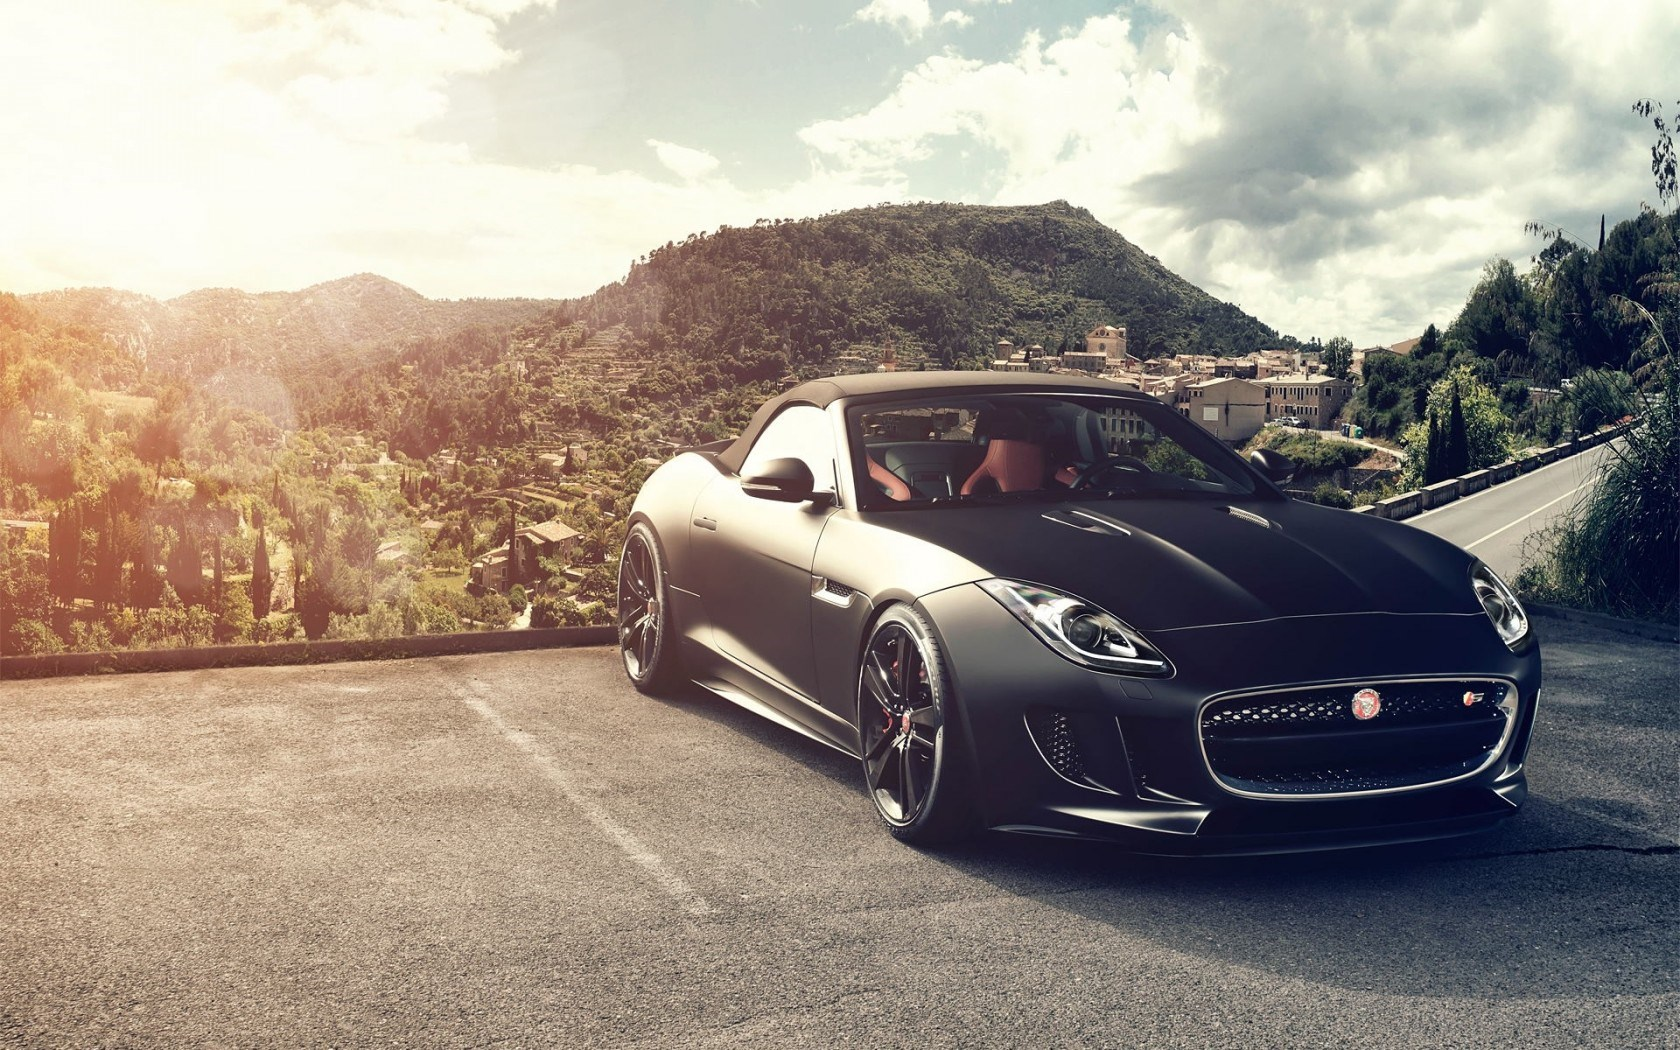 Jaguar F Type Tuning Jaguar Cars Wallpapers Hd Download Aoutos Hd